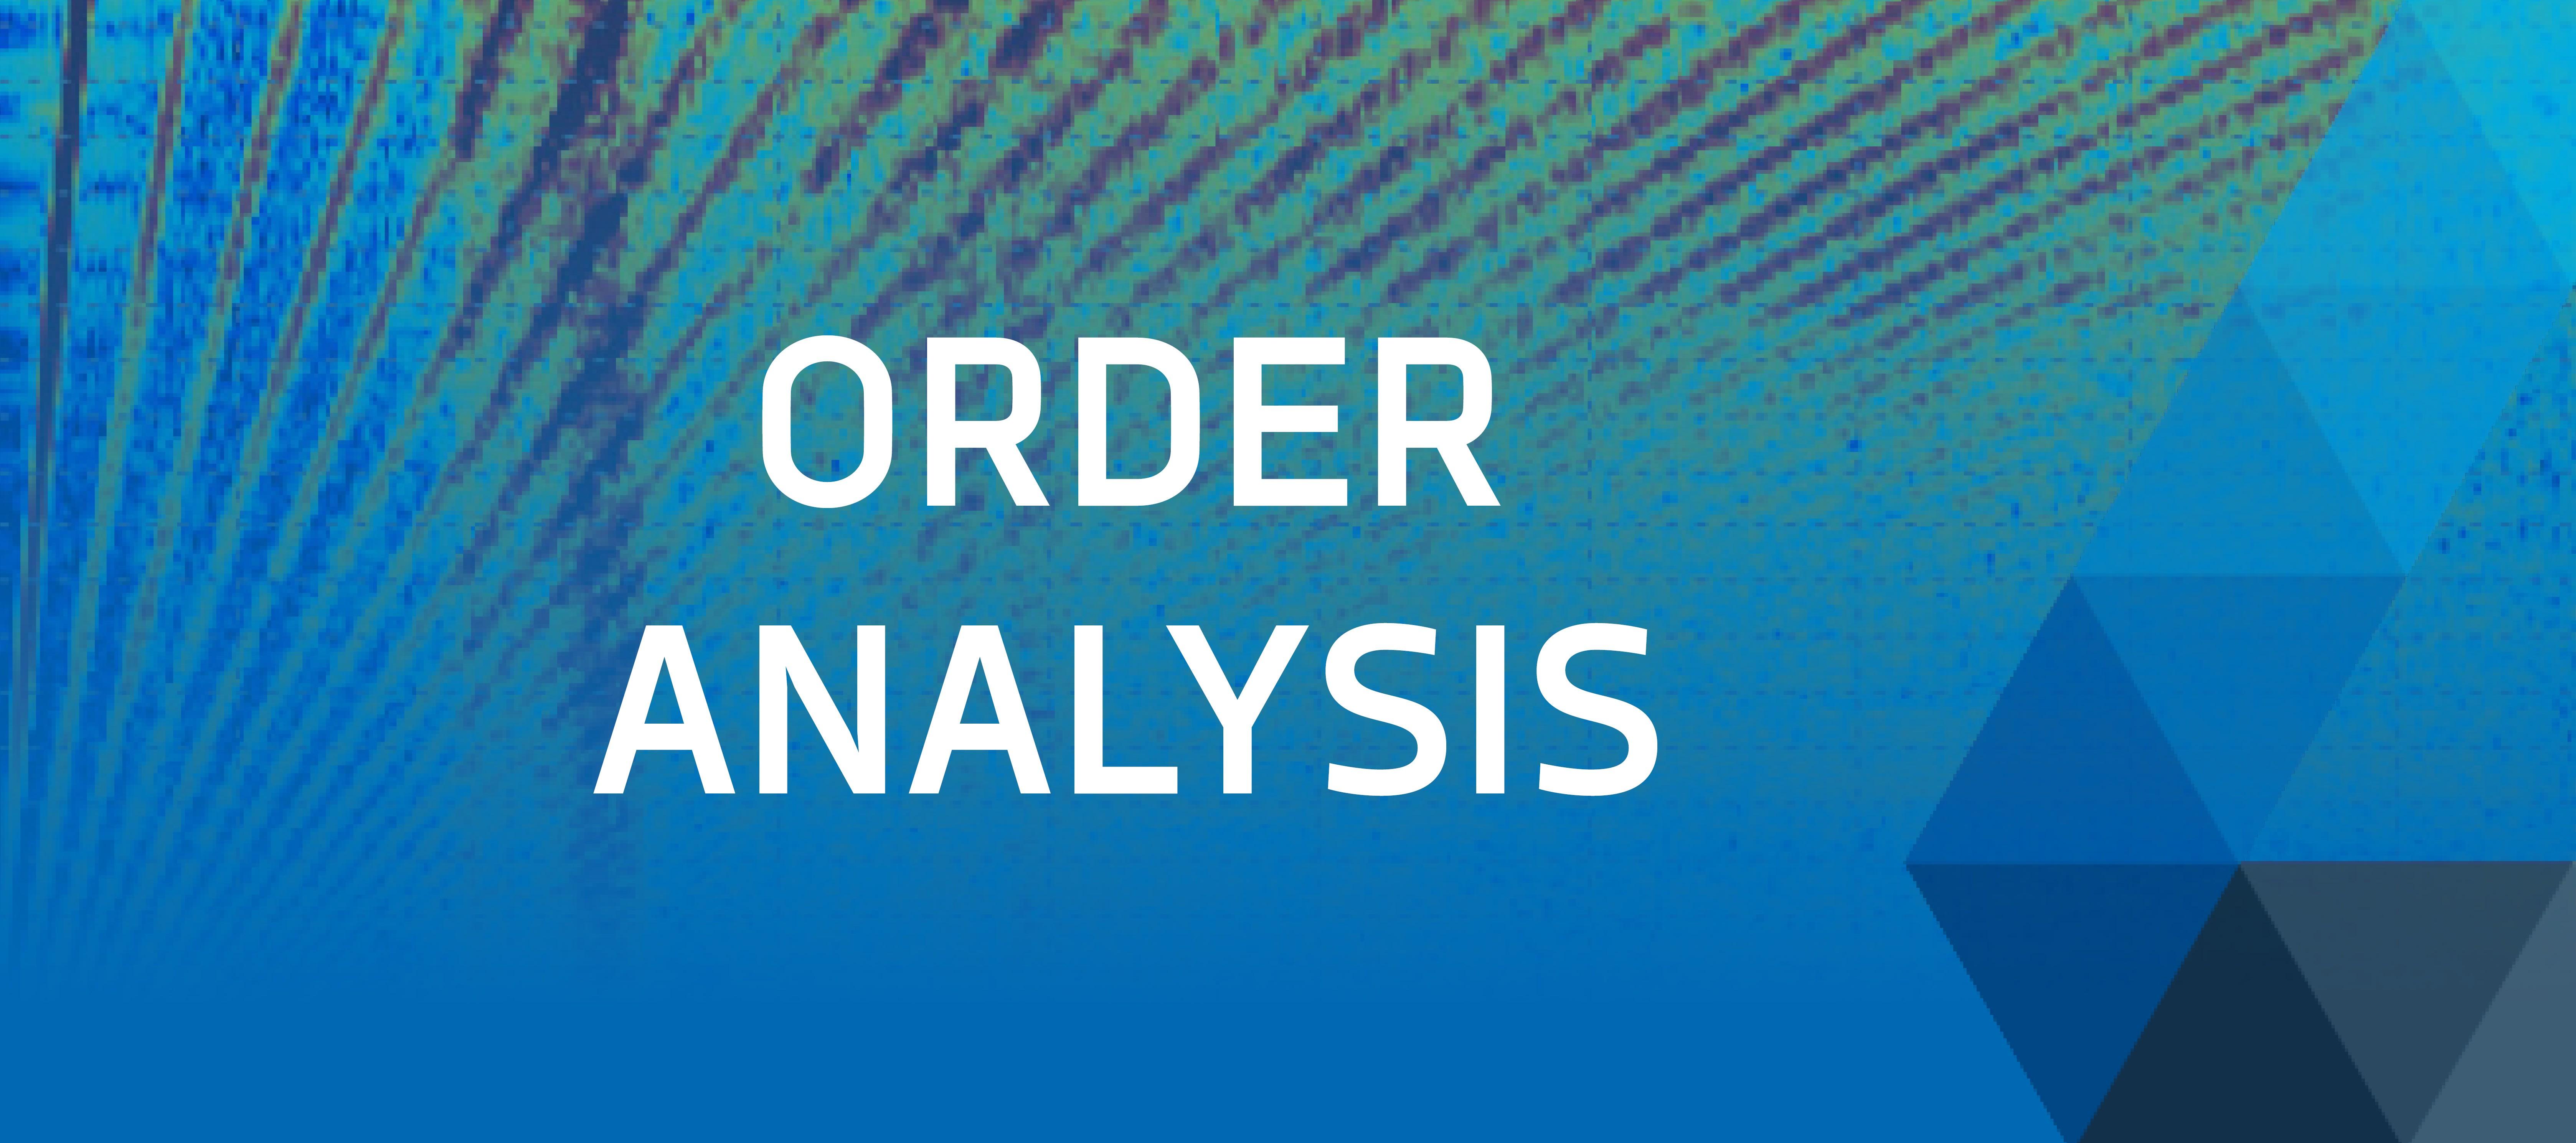 Order Analysis by DEWETRON banner